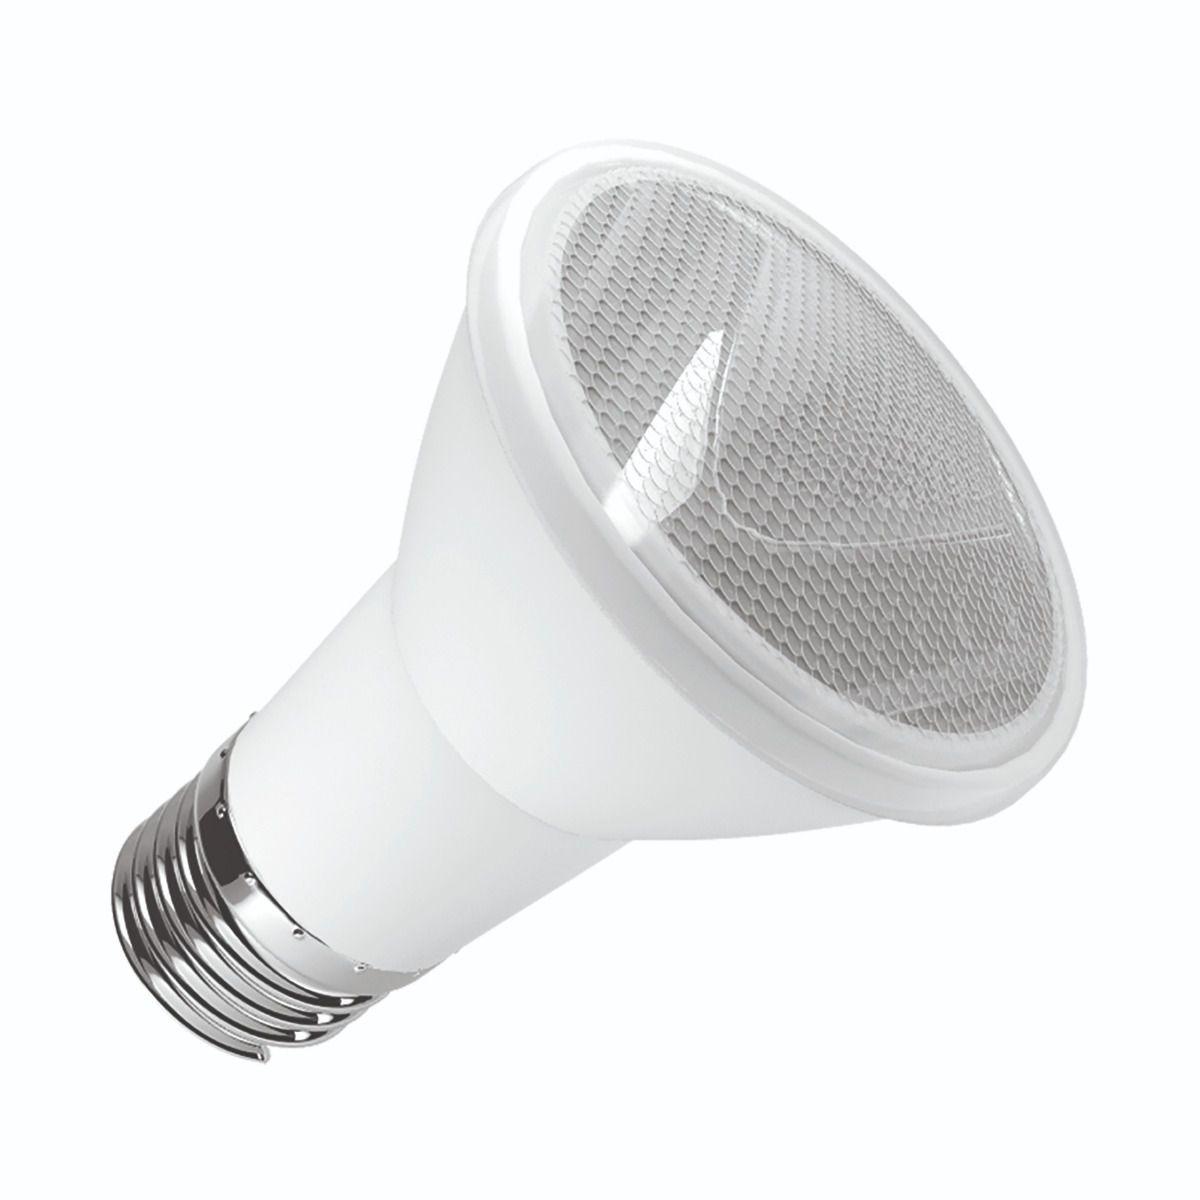 Lâmpada LED 6W 6000K PAR20 - (Bivolt)